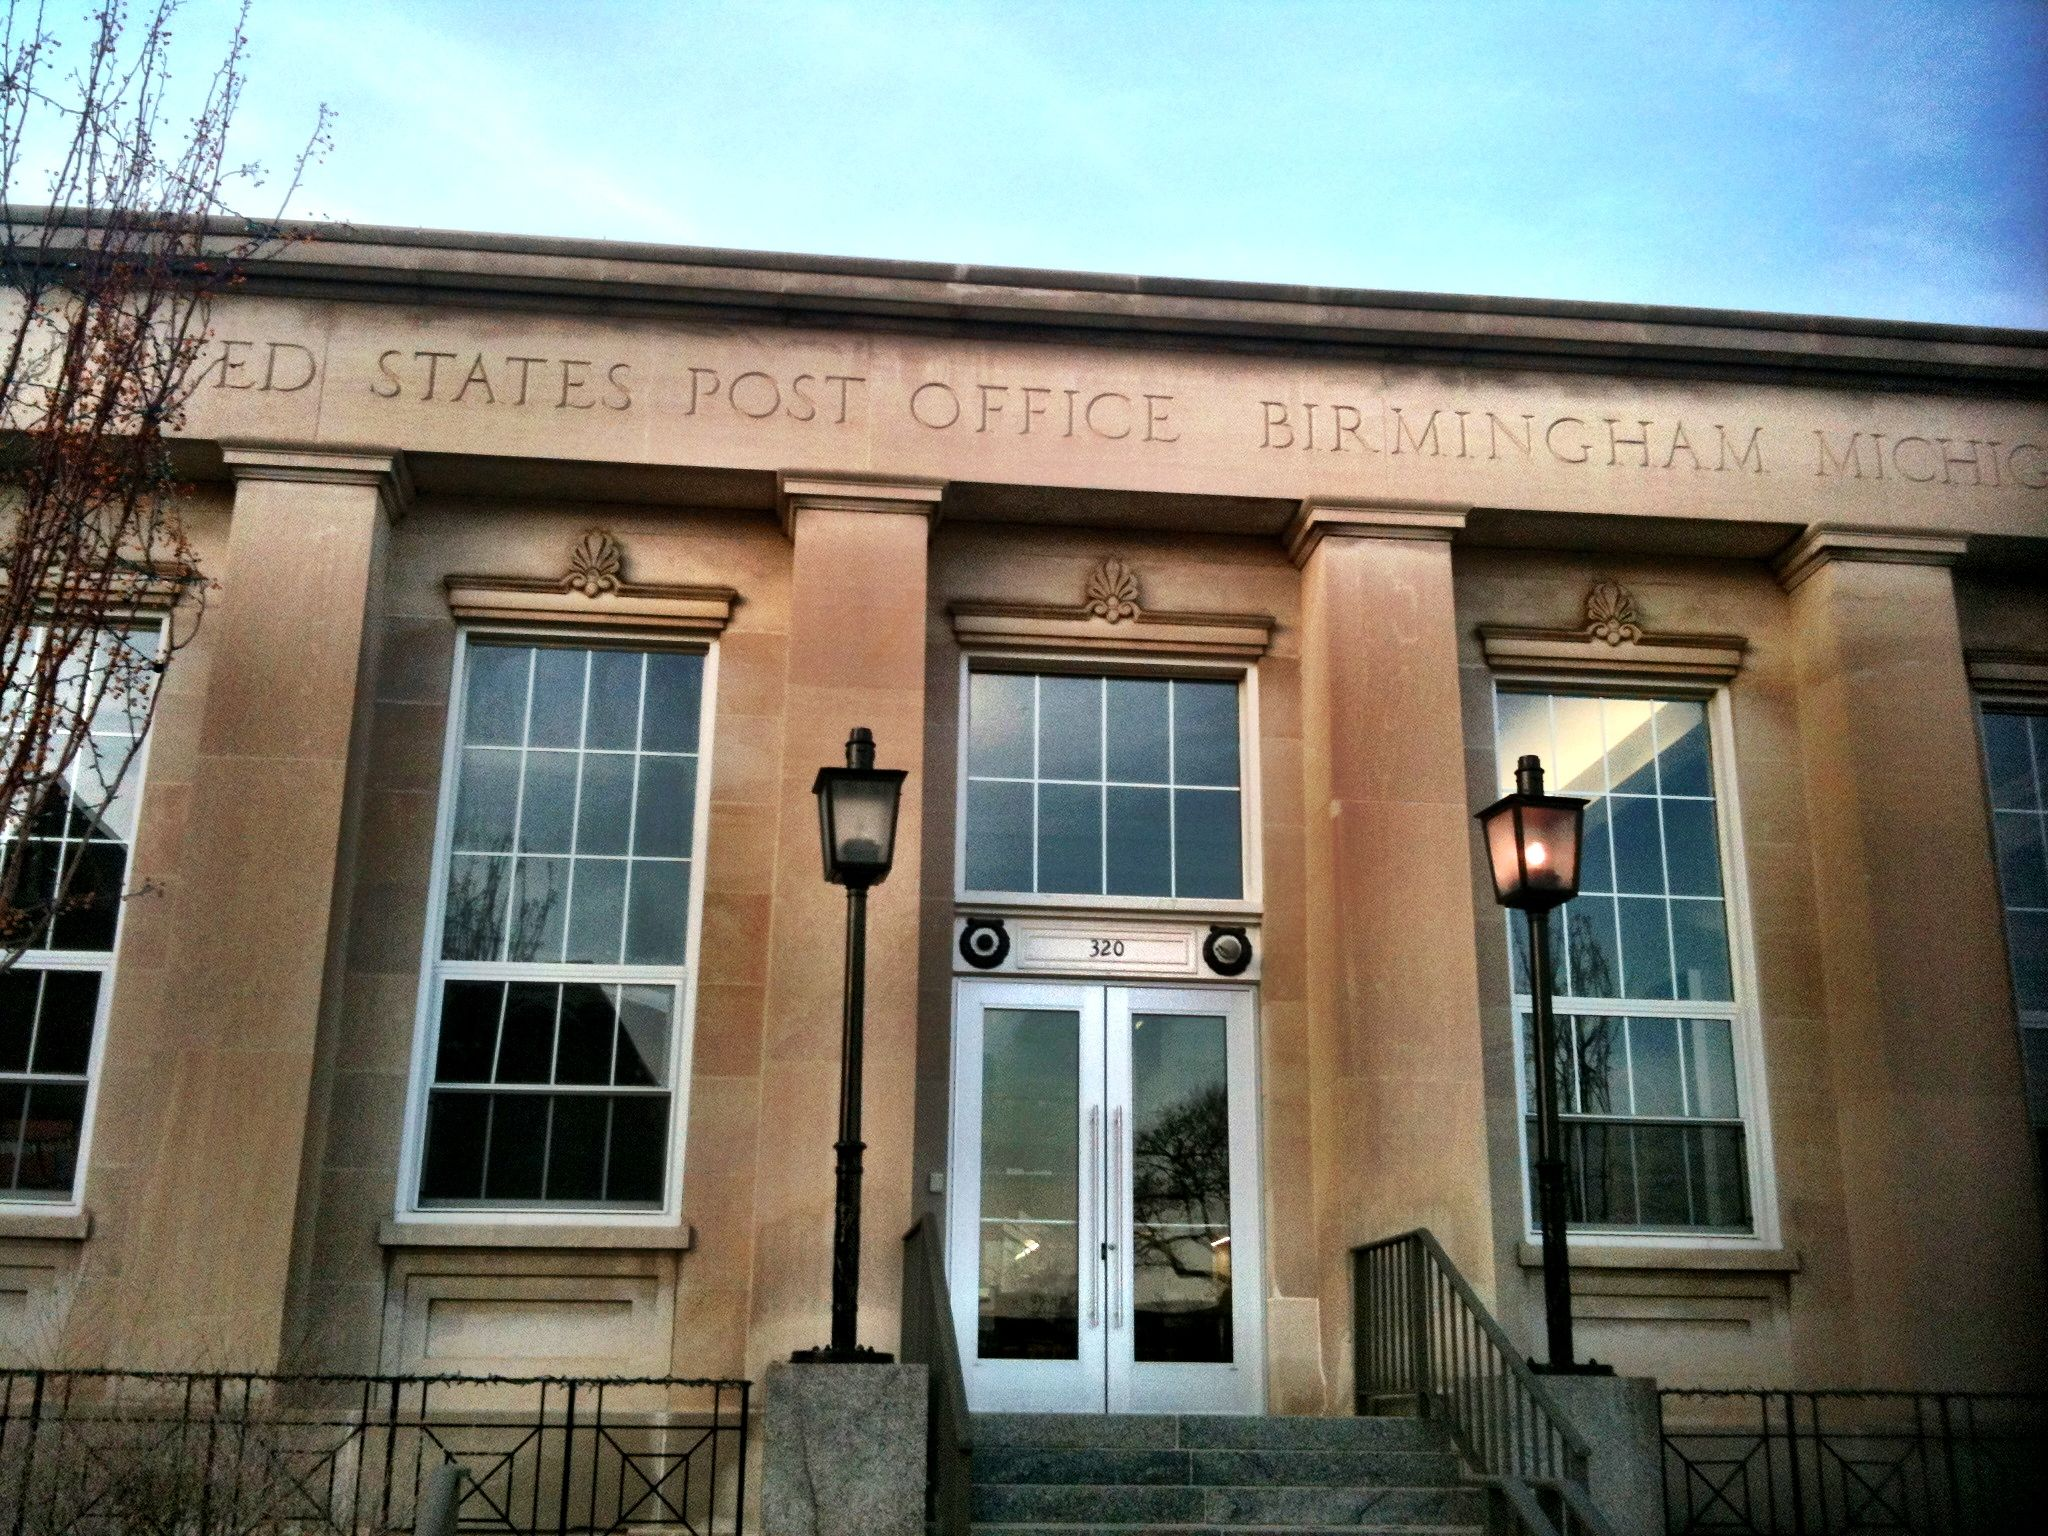 Birmingham Michigan Old Post Office